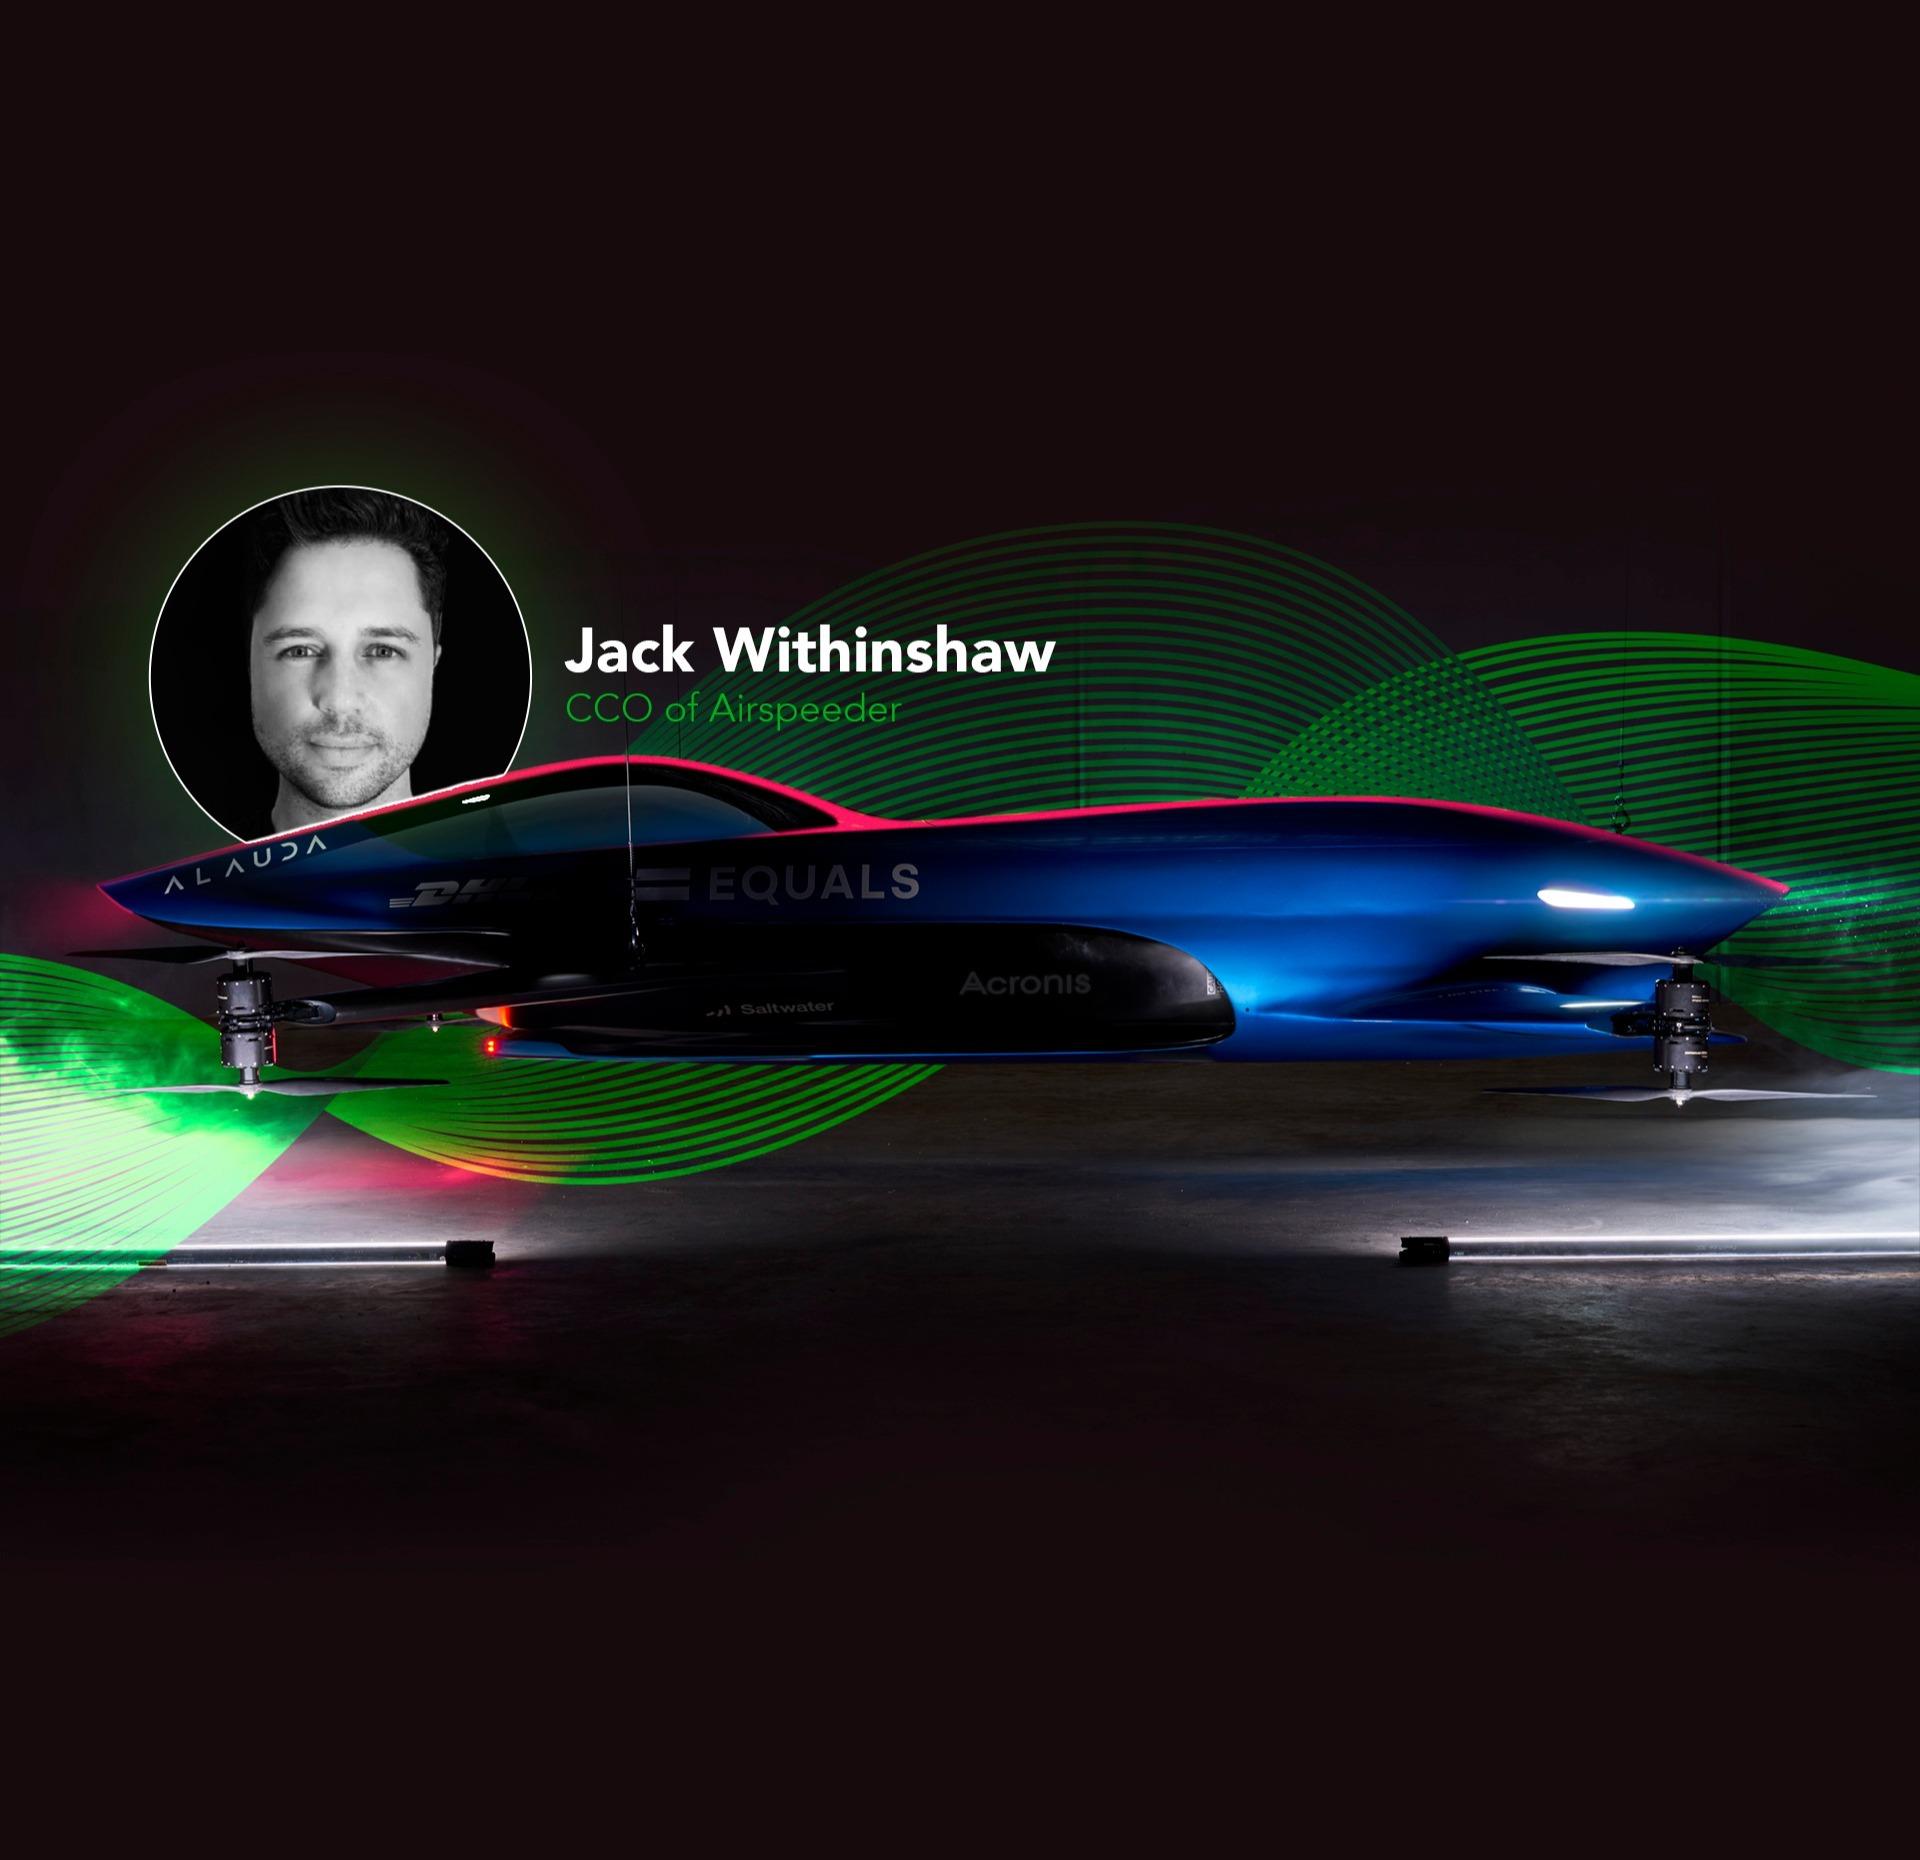 Electrov8-Airspeed - Jack Withinshaw-1-1